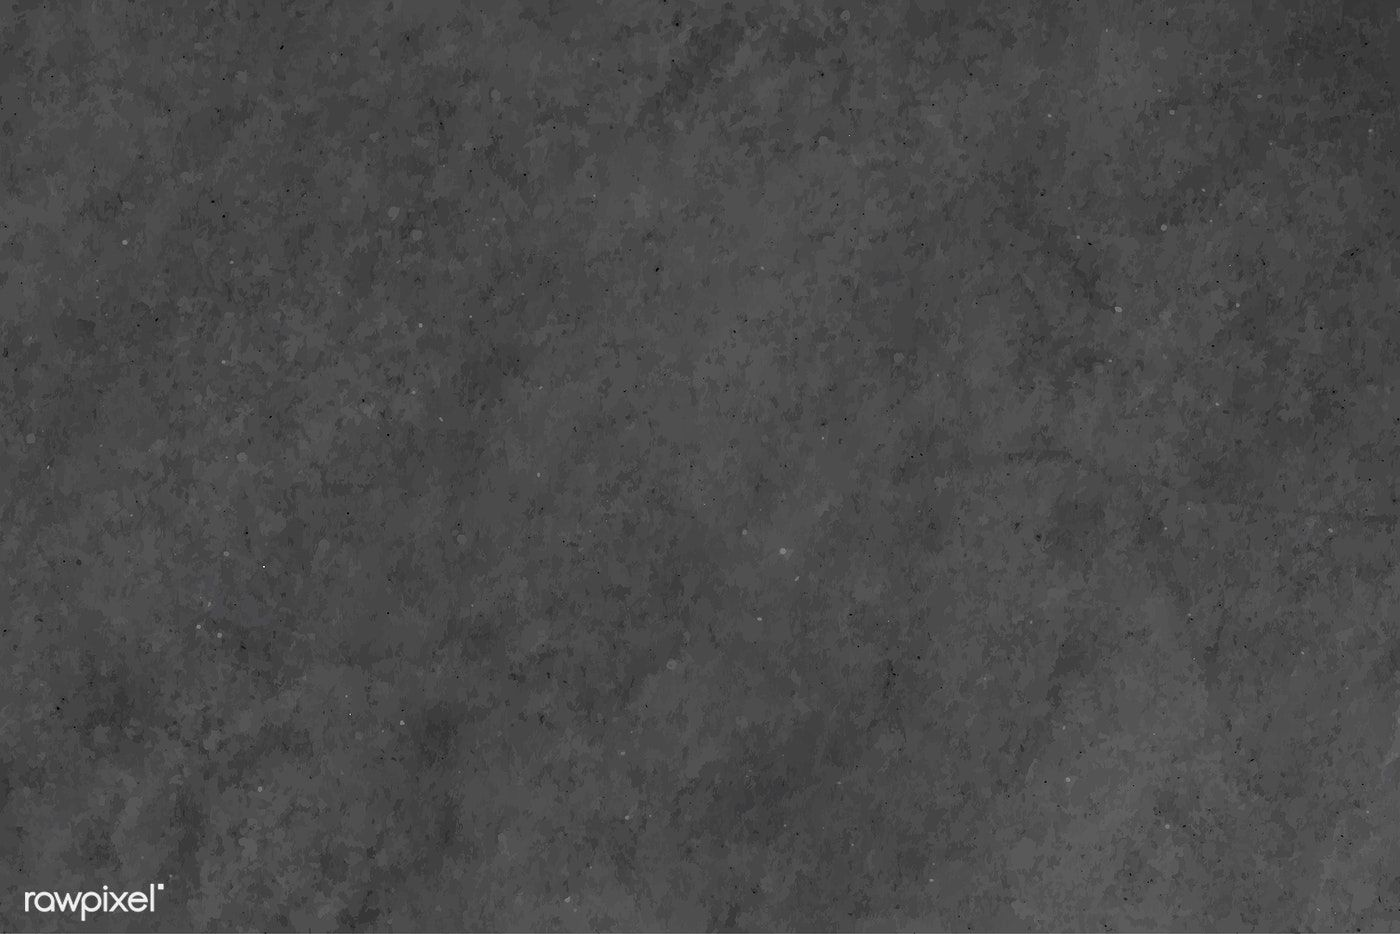 Grunge Dark Gray Concrete Textured Background Vector Free Image By Rawpixel Com Aom Woraluck Hwangma Concrete Texture Dark Grey Wallpaper Dark Grey Walls